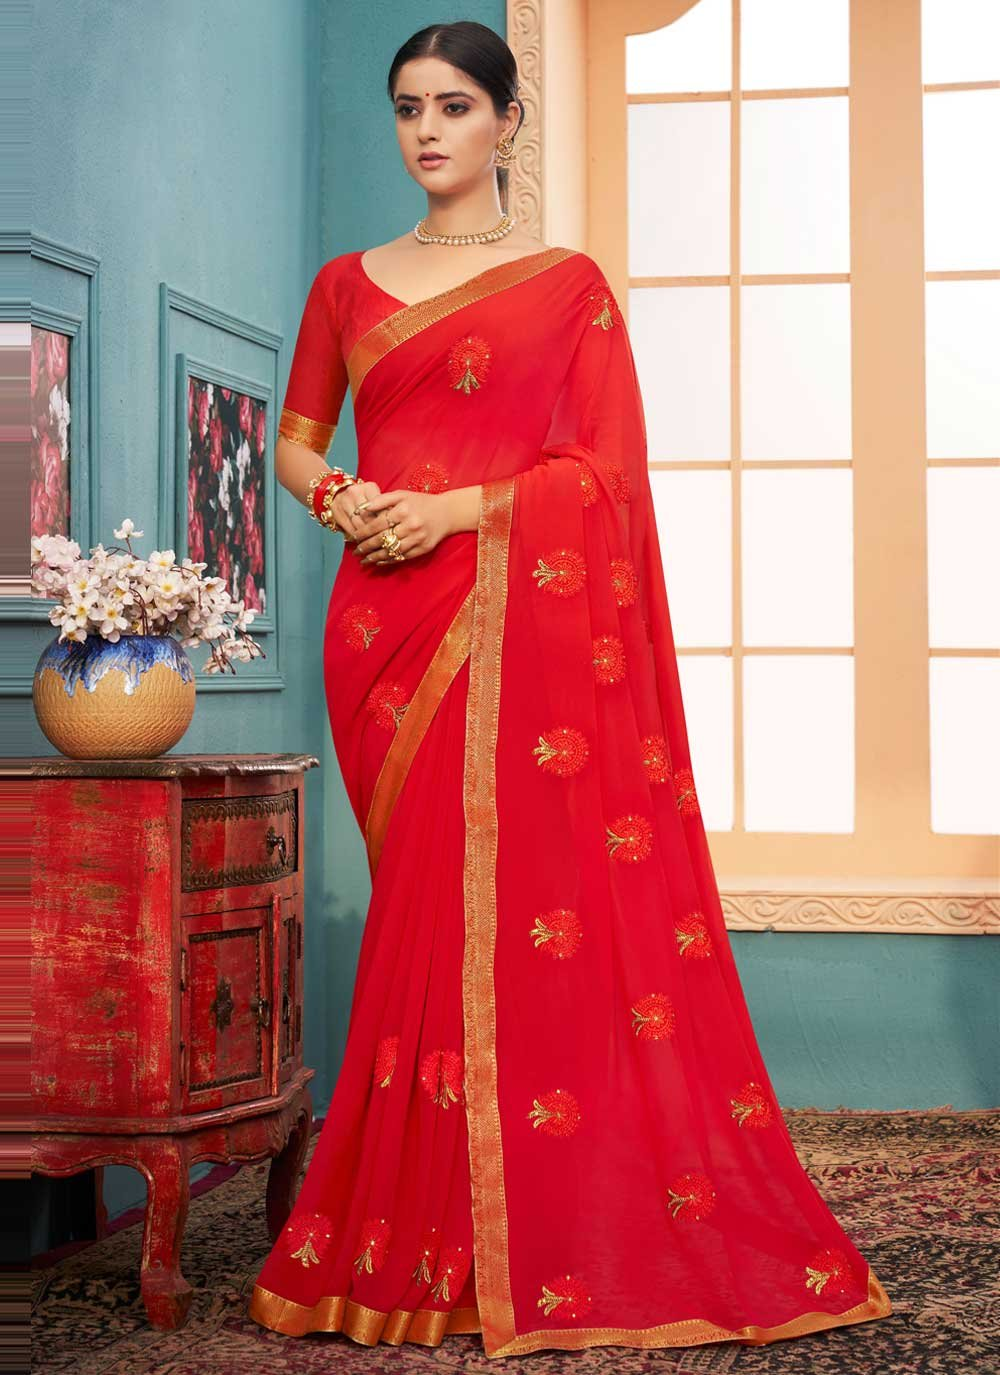 Faux Georgette Lace Red Classic Designer Saree